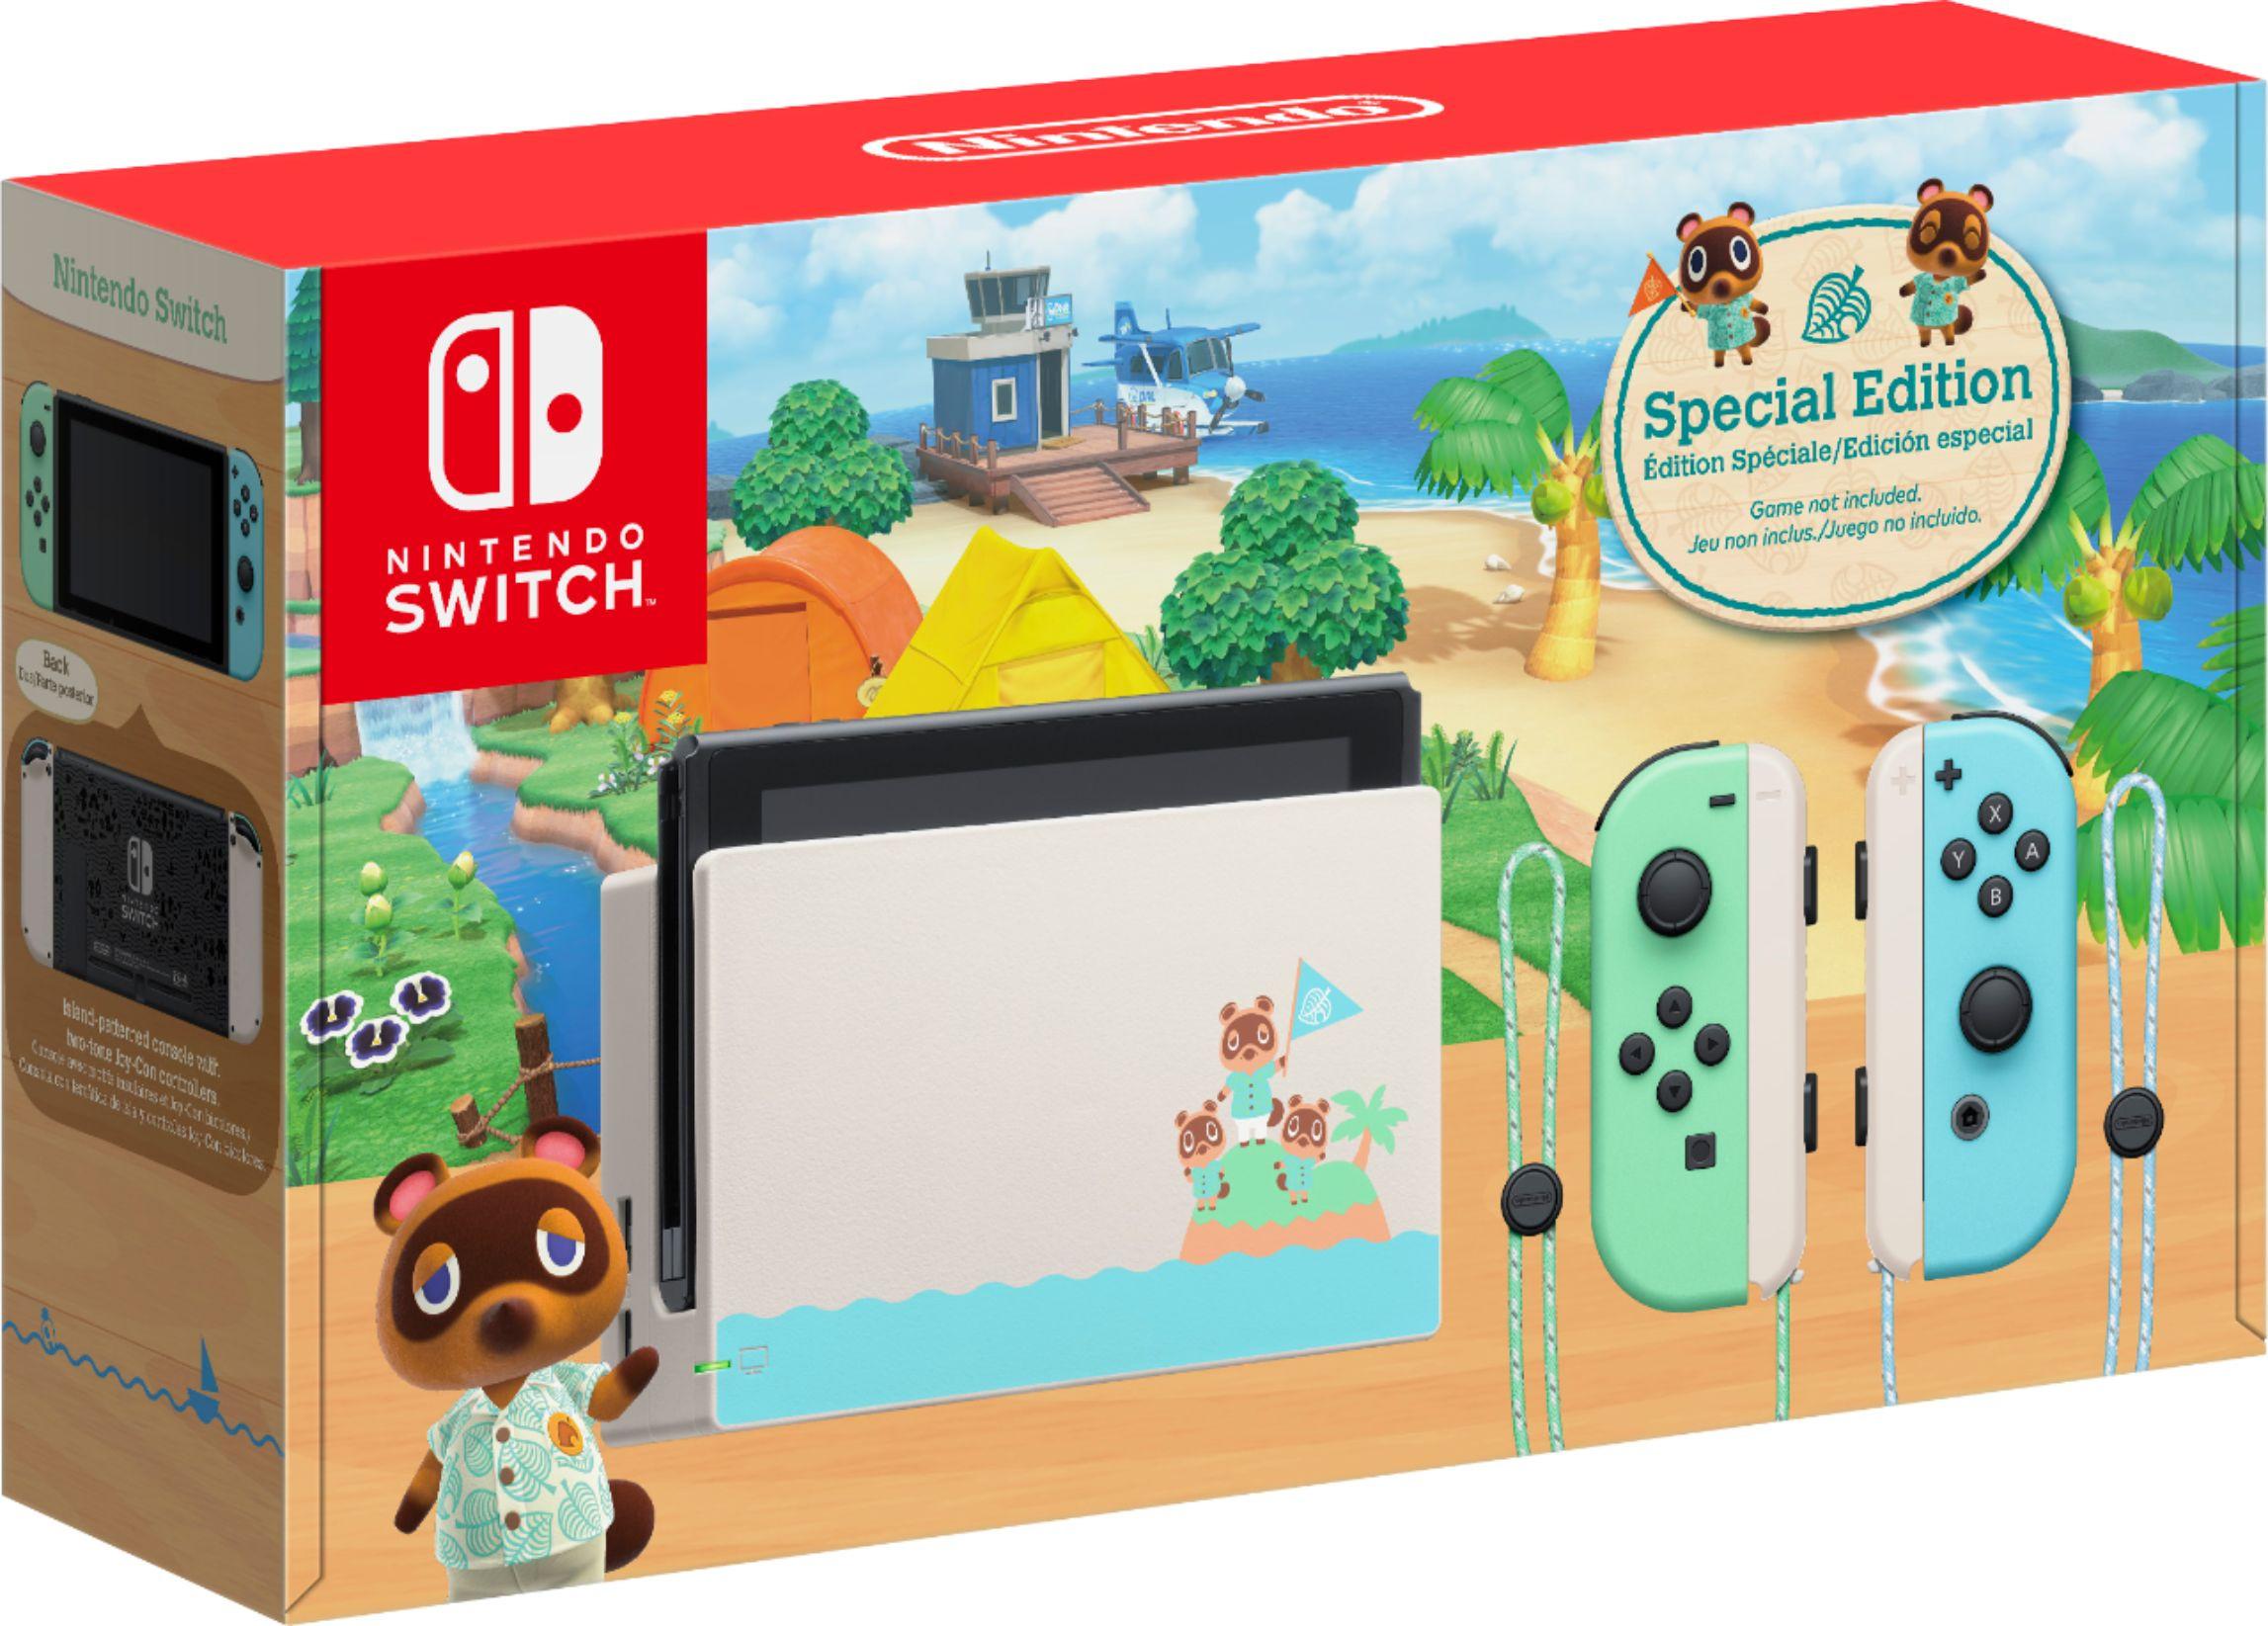 Animal Crossing Nintendo Switch console (refurbished YMMV) $269.99